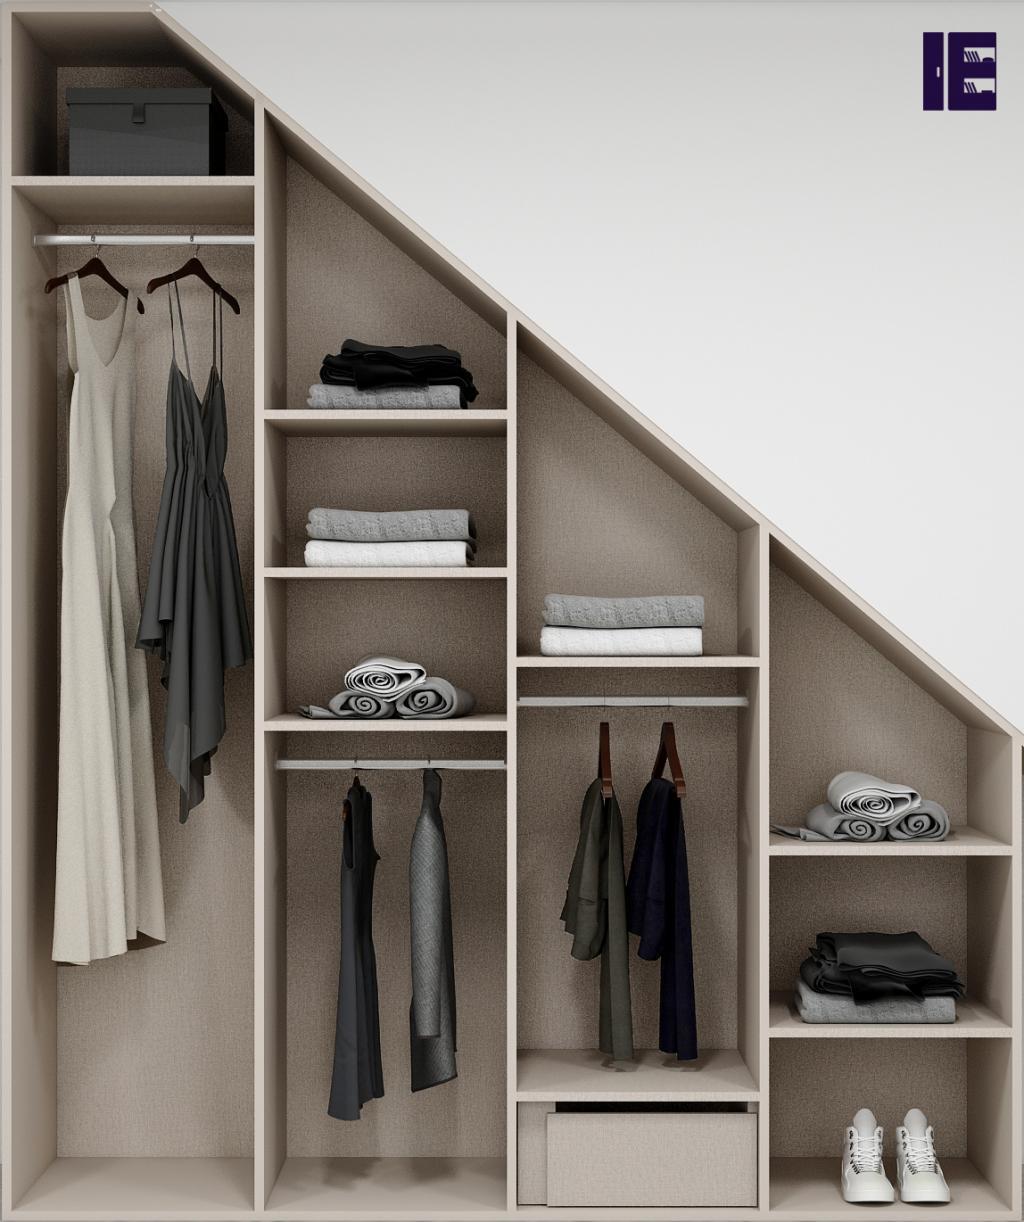 Wardrobe with Shoe Rack Top of Wardrobe Storage Internal Wardrobe 9 Image